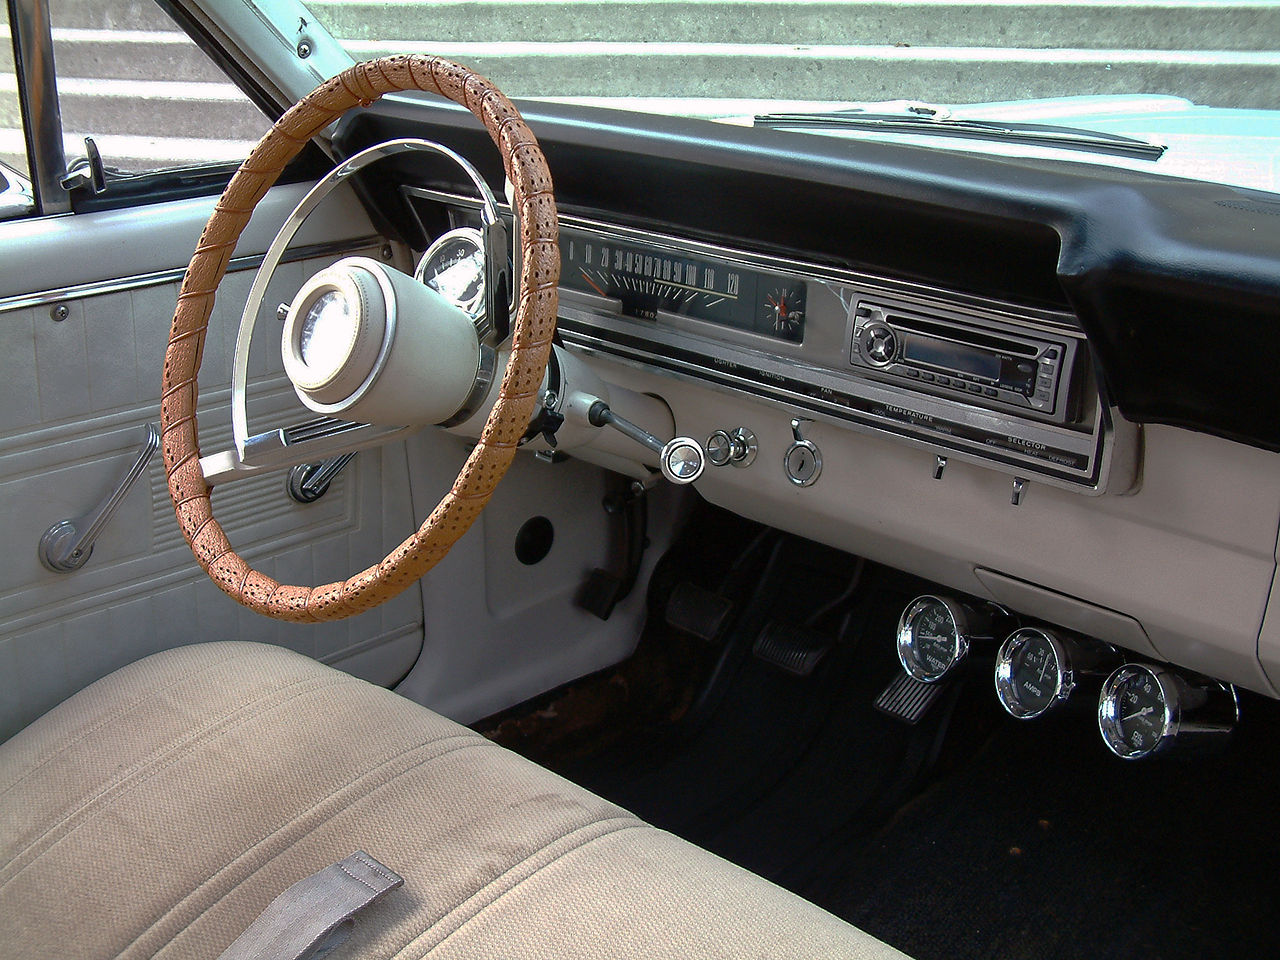 1990 Ford Ranger Bench Seat